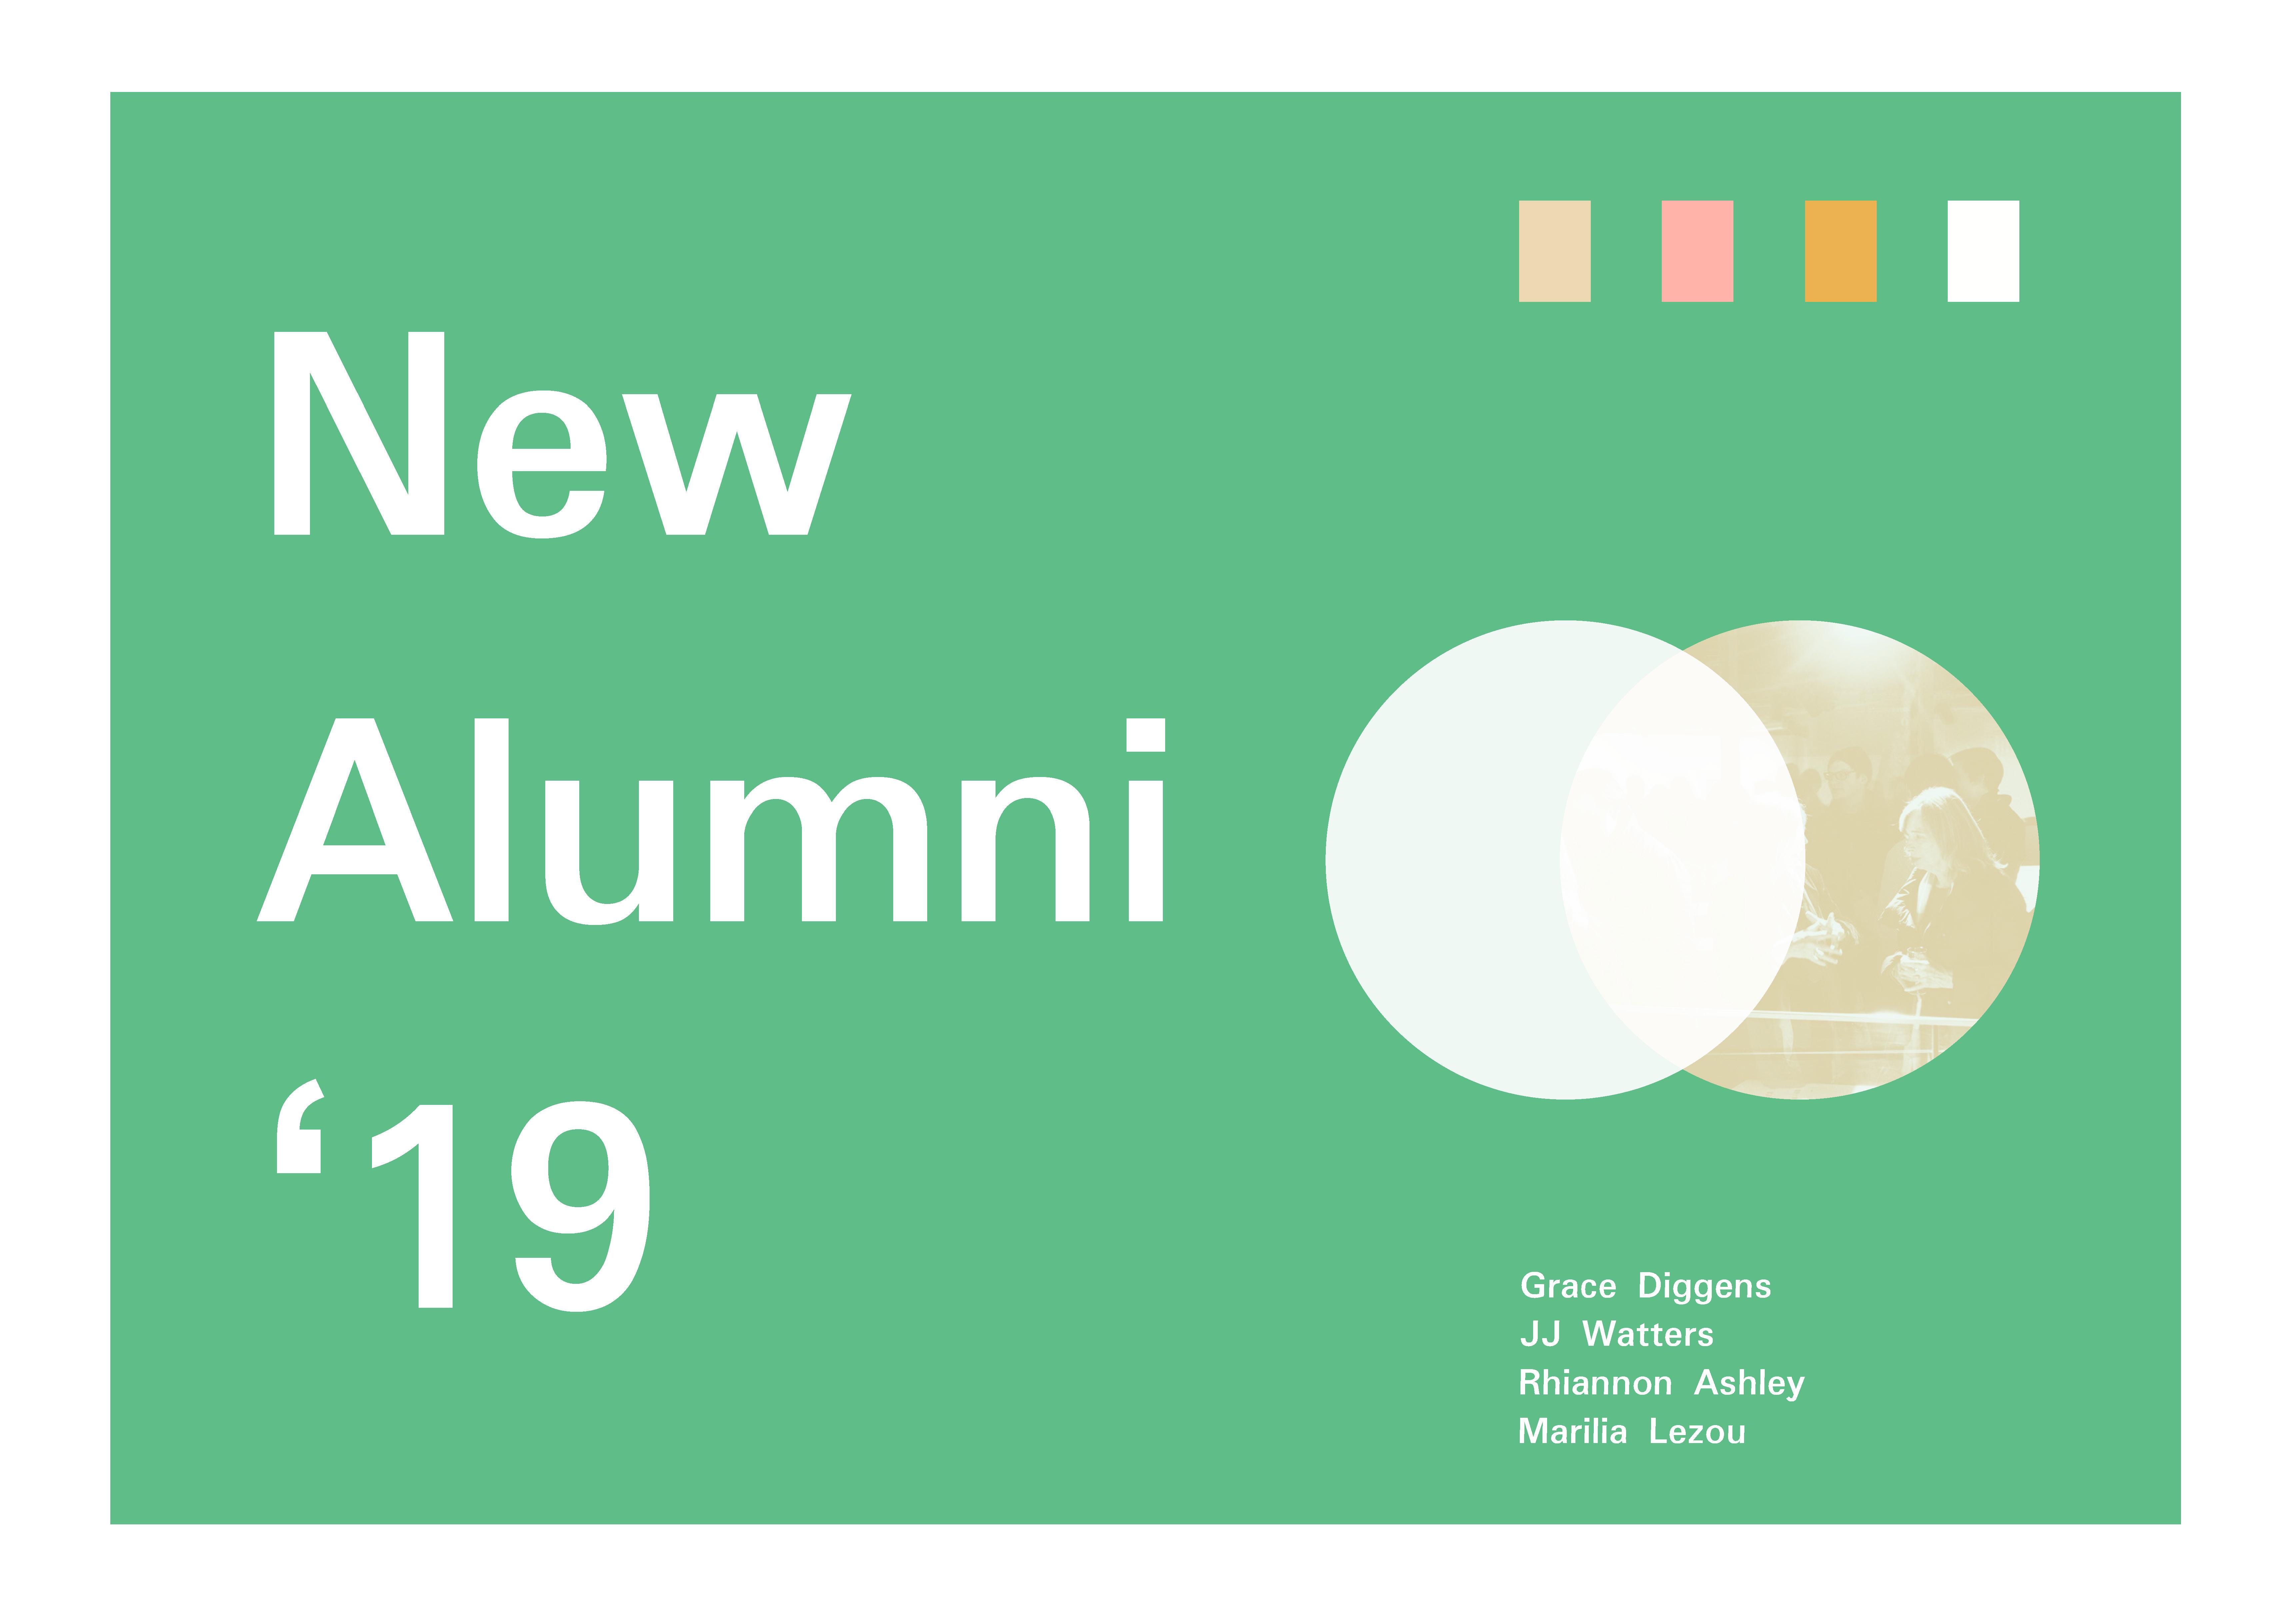 Poster design for New Alumni '19